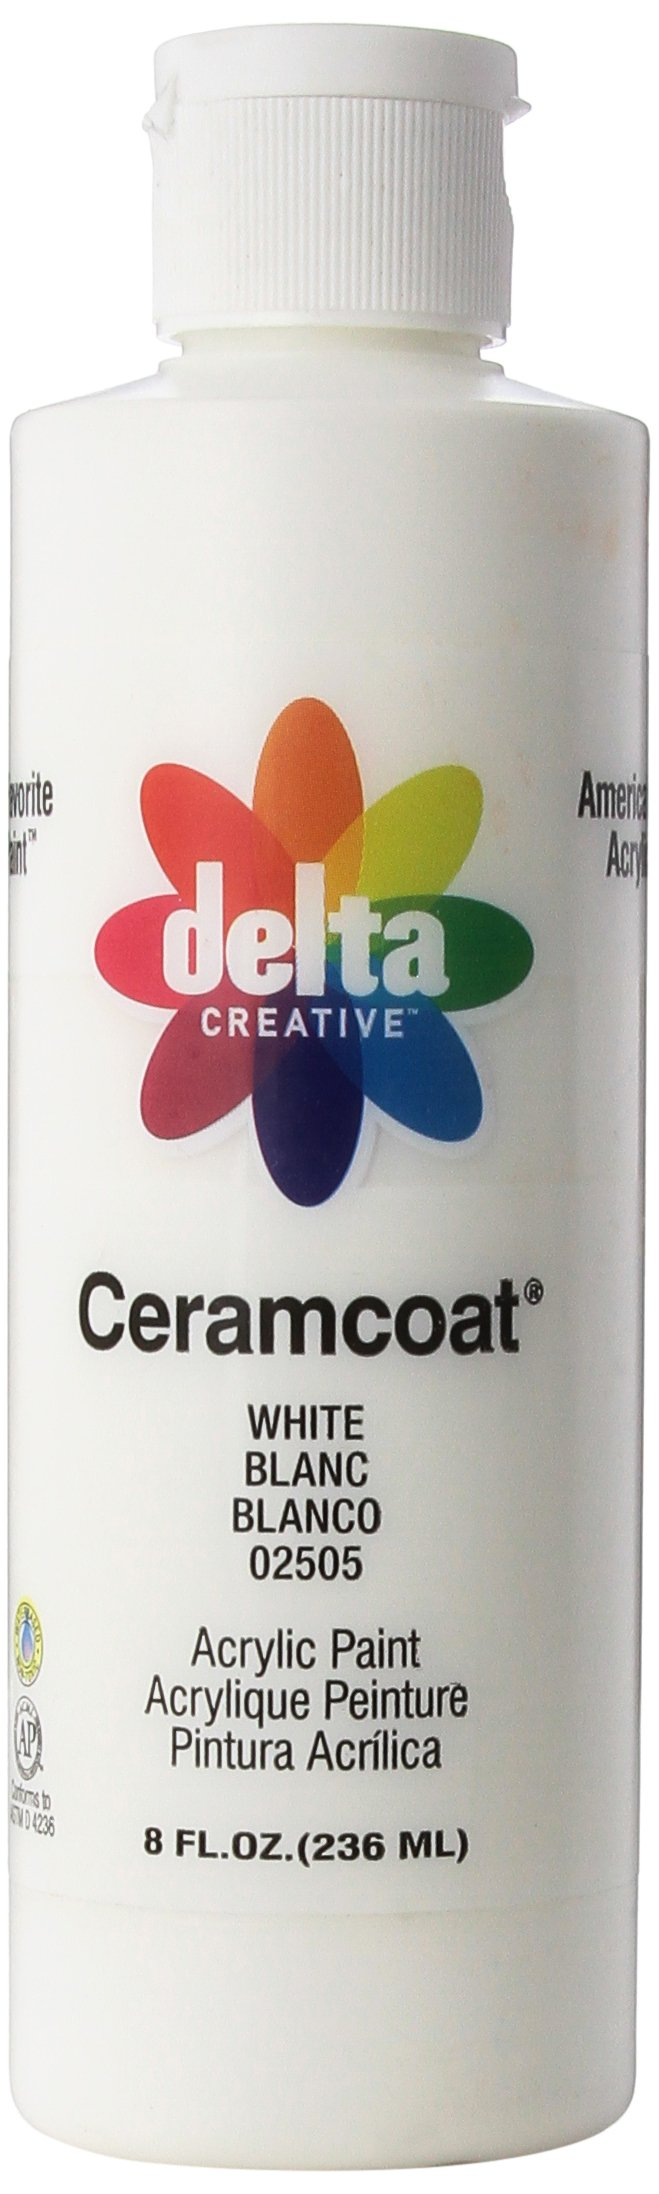 Delta Creative Ceramcoat Assorted 025058